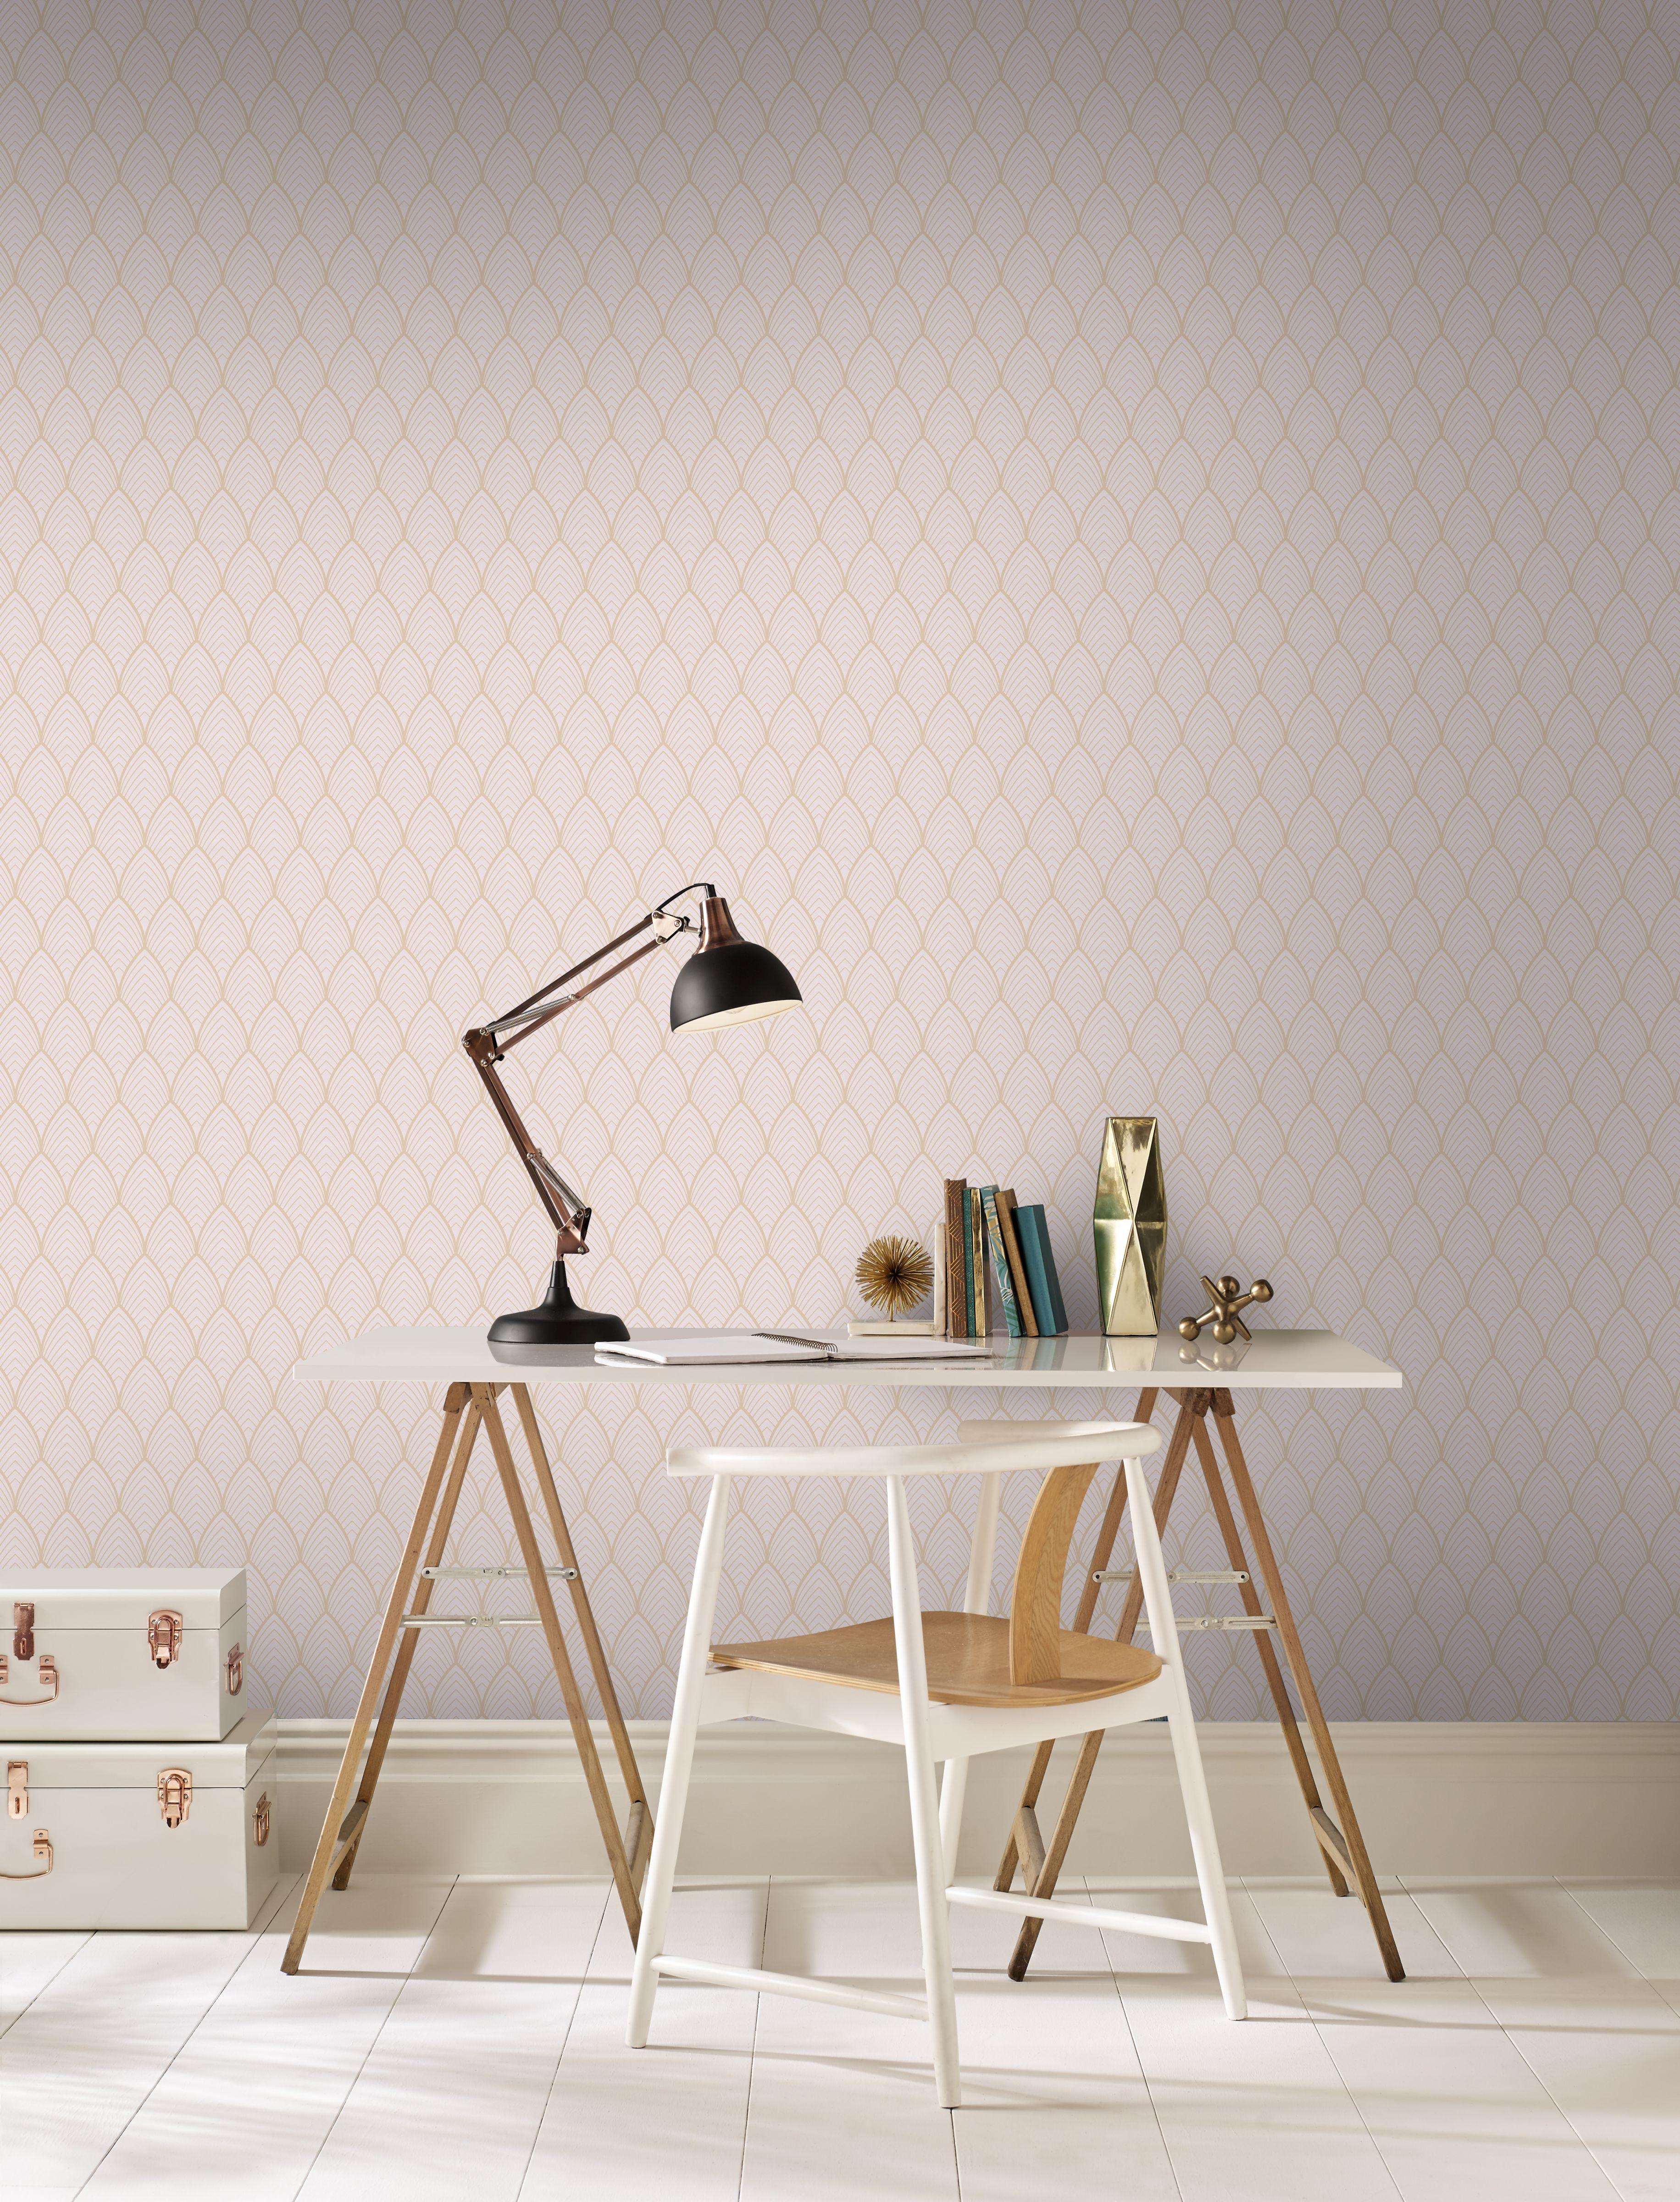 Papier peint intissé Bercy rose 1005x52cm